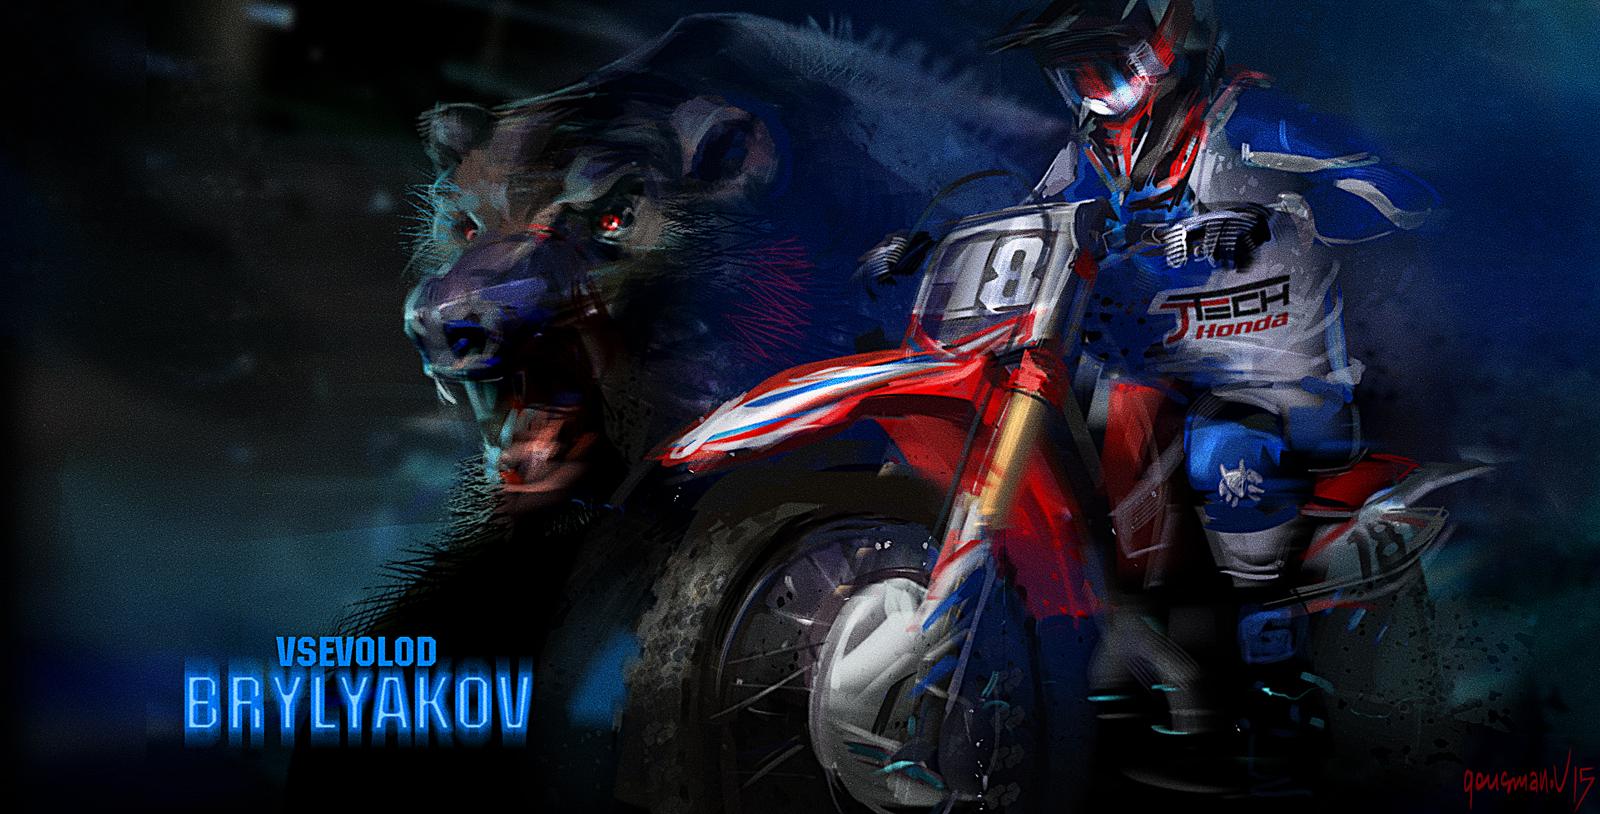 brylyakov_gousman_4_1600